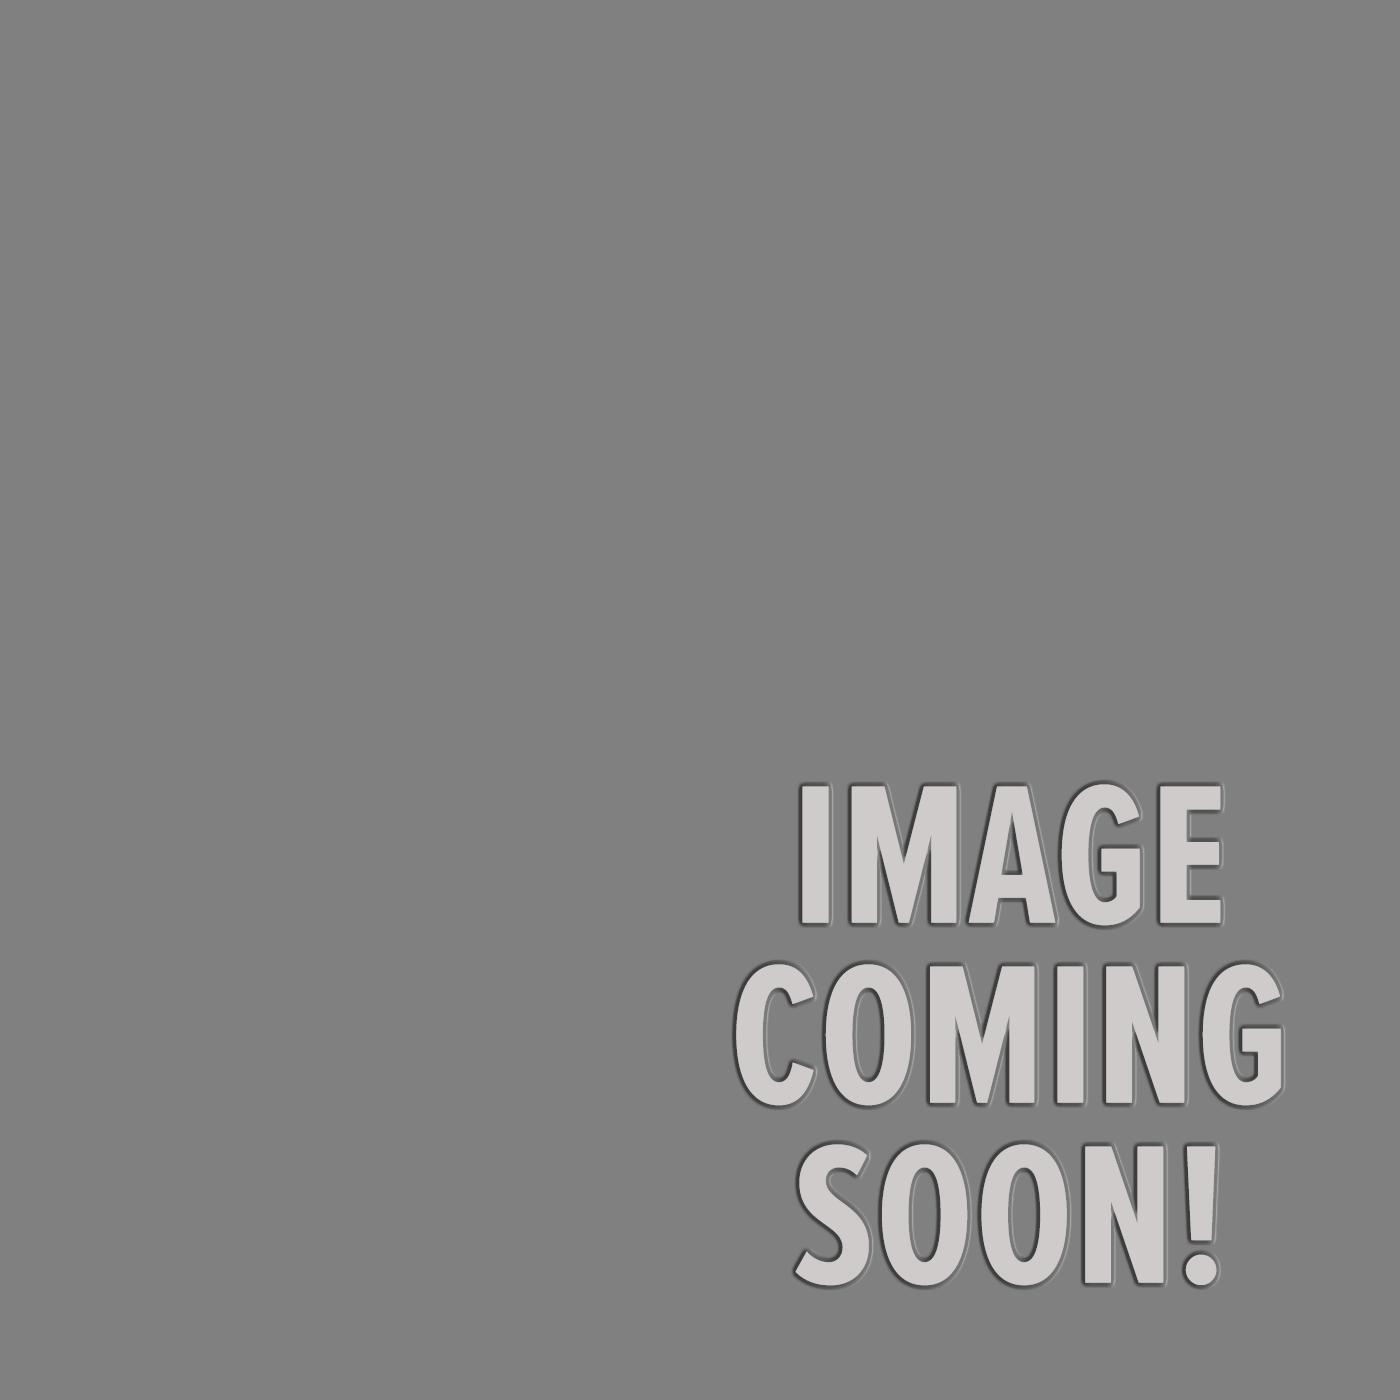 Fender Player Plus Nashville Telecaster Electric Guitar